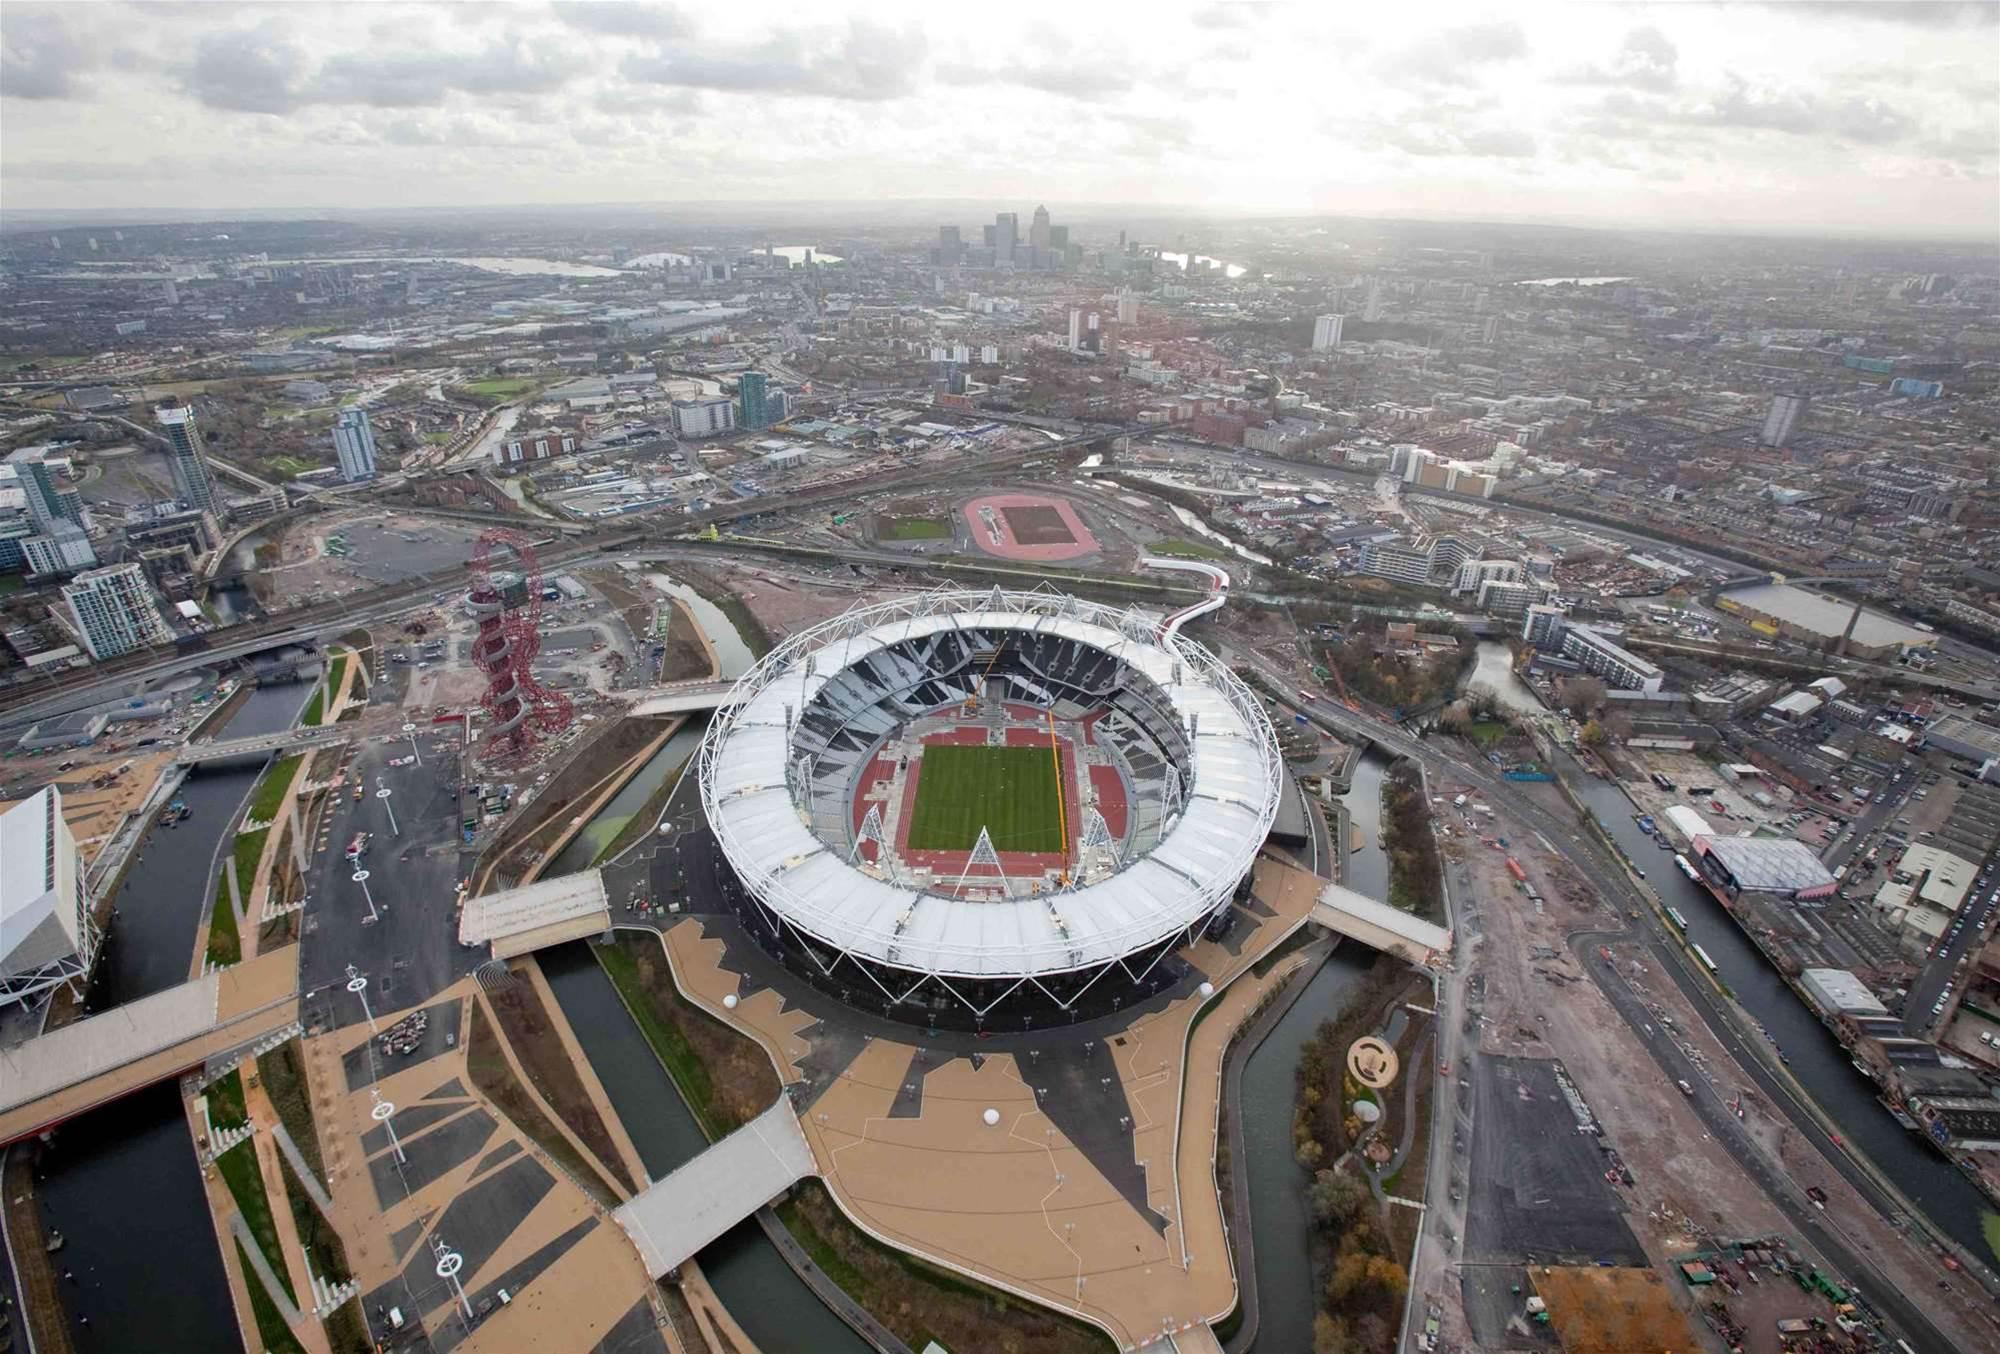 London gets massive free wi-fi zone